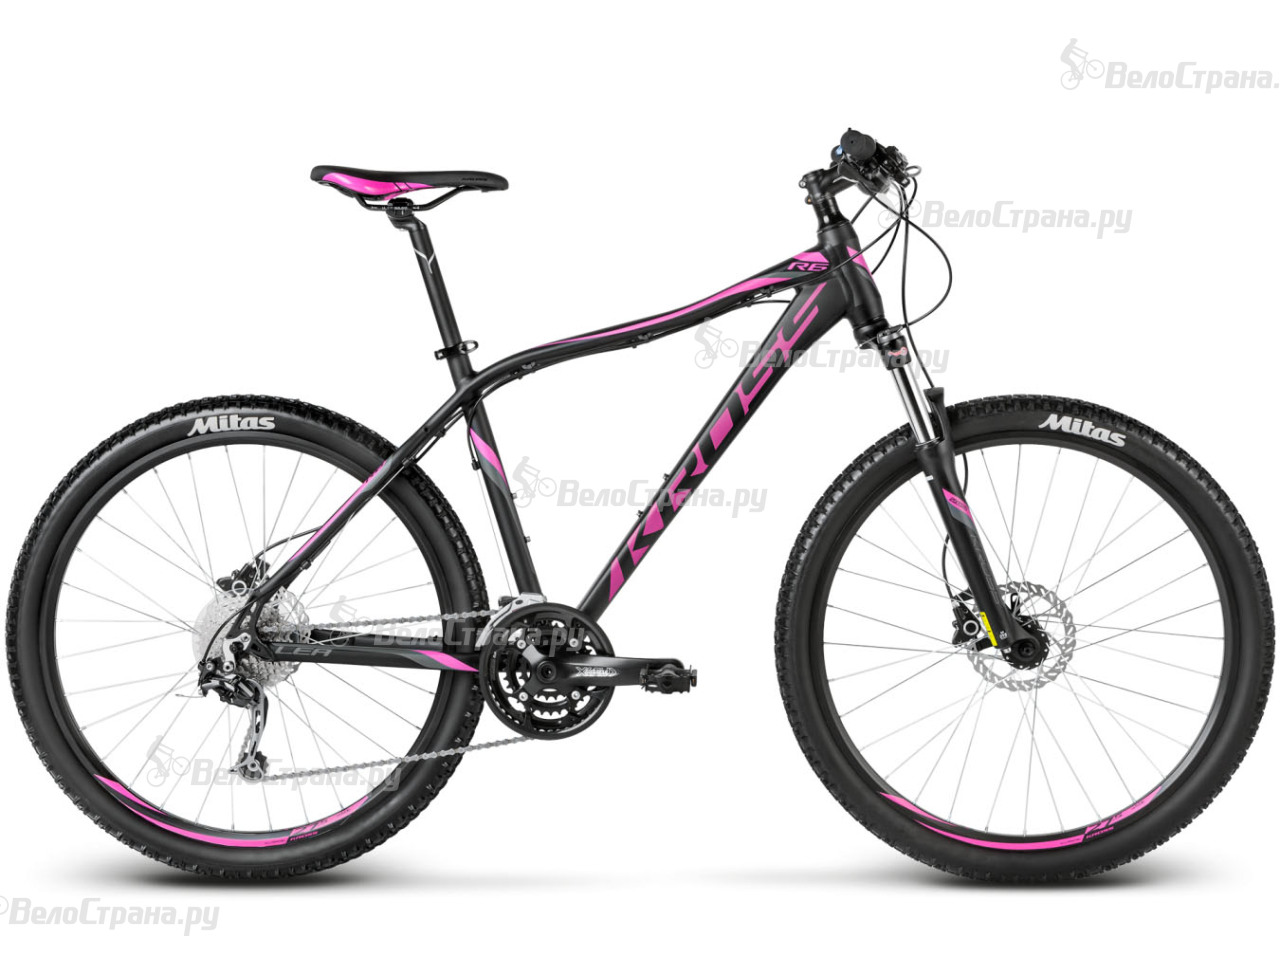 Велосипед Kross Lea R6 (2017) велосипед kross lea f4 2017